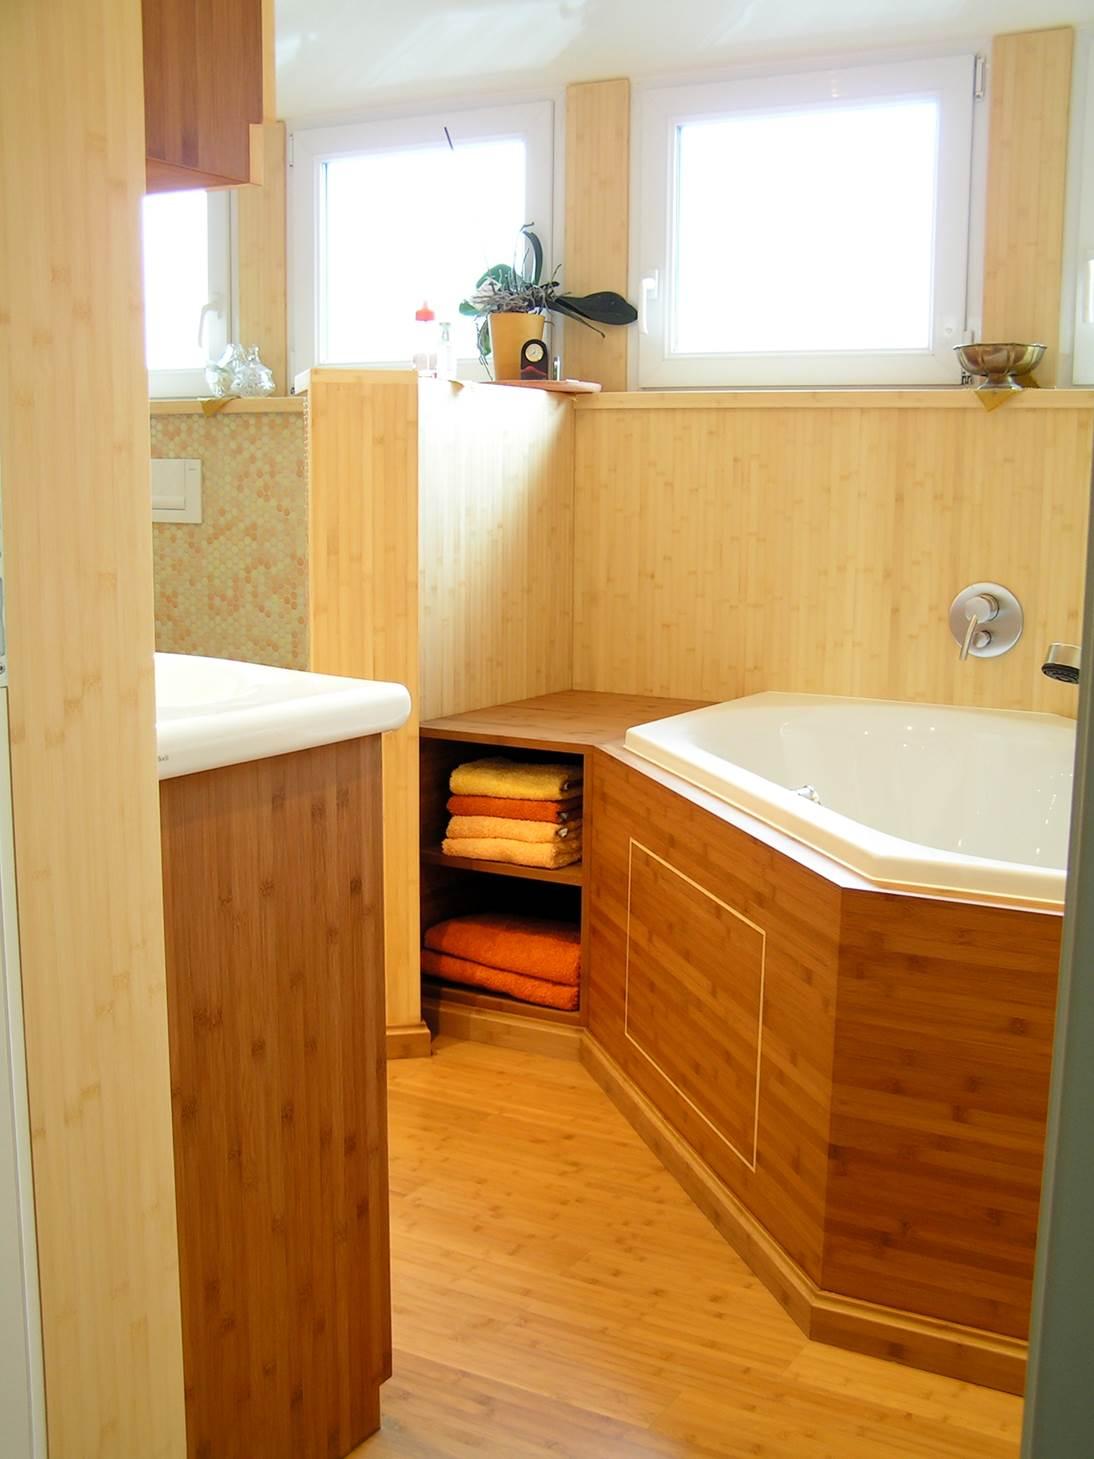 baderaum casa nova m belwerkst tten. Black Bedroom Furniture Sets. Home Design Ideas